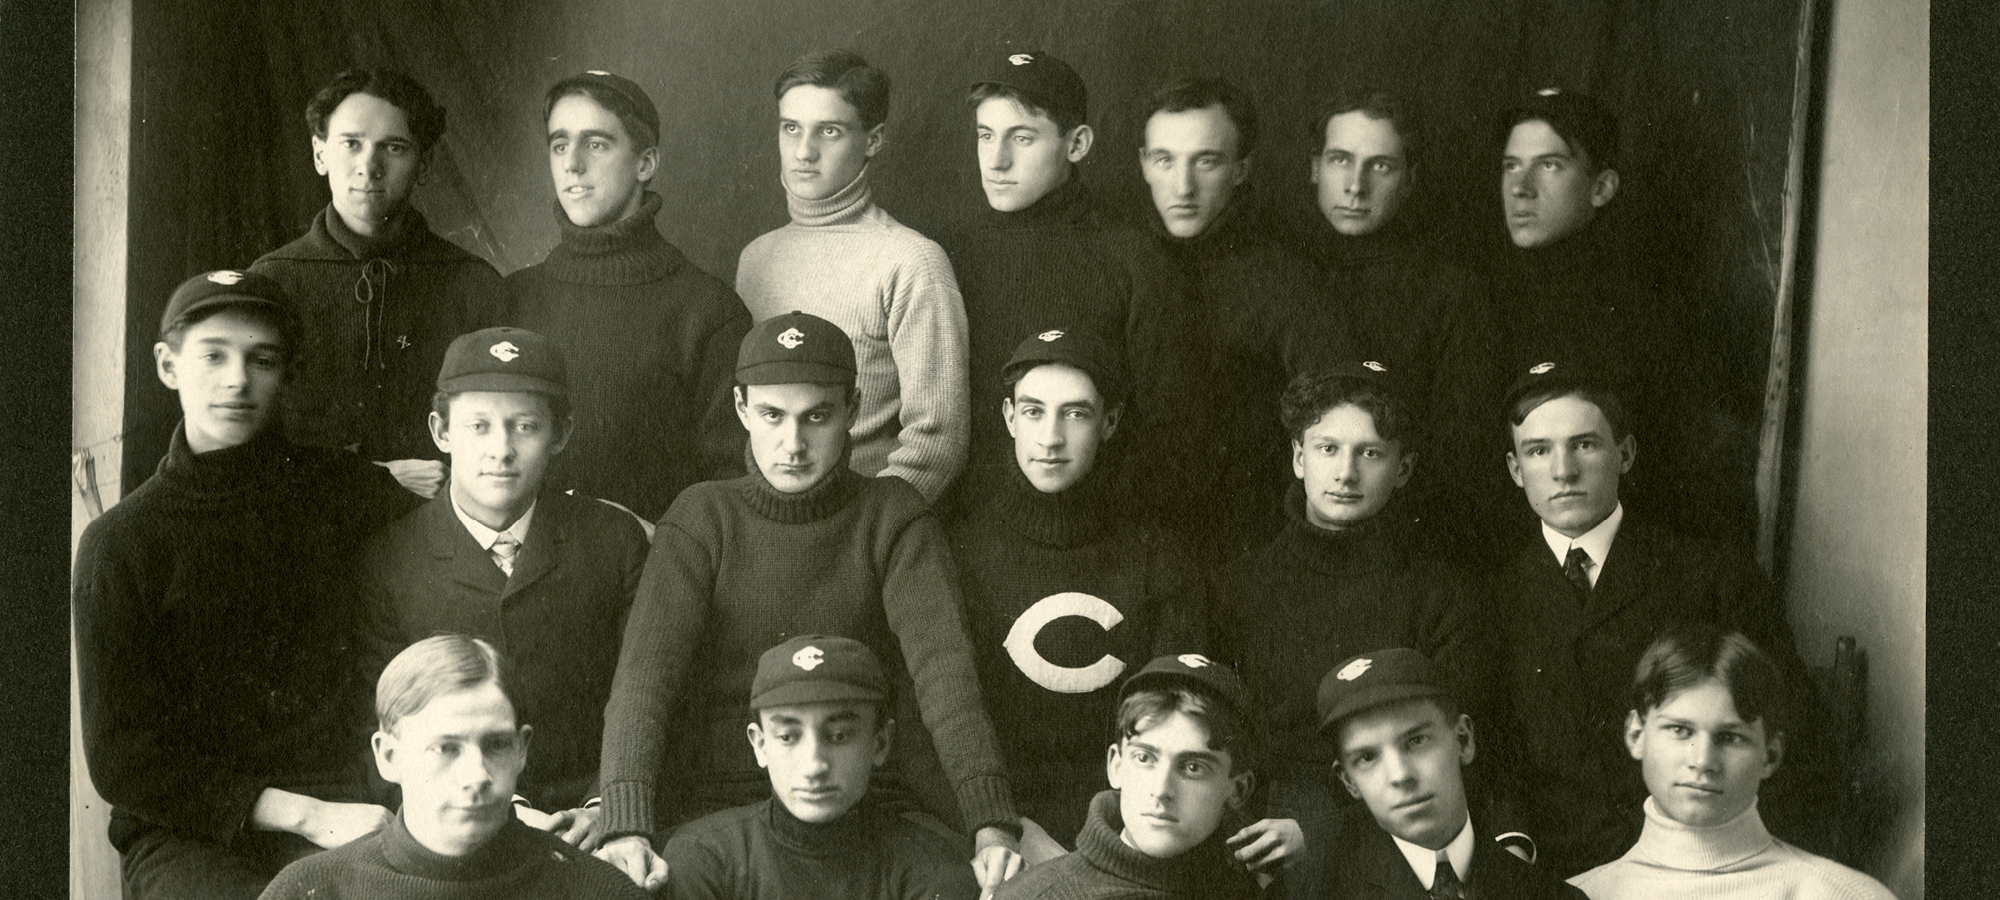 UChicago cross-country team circa 1900